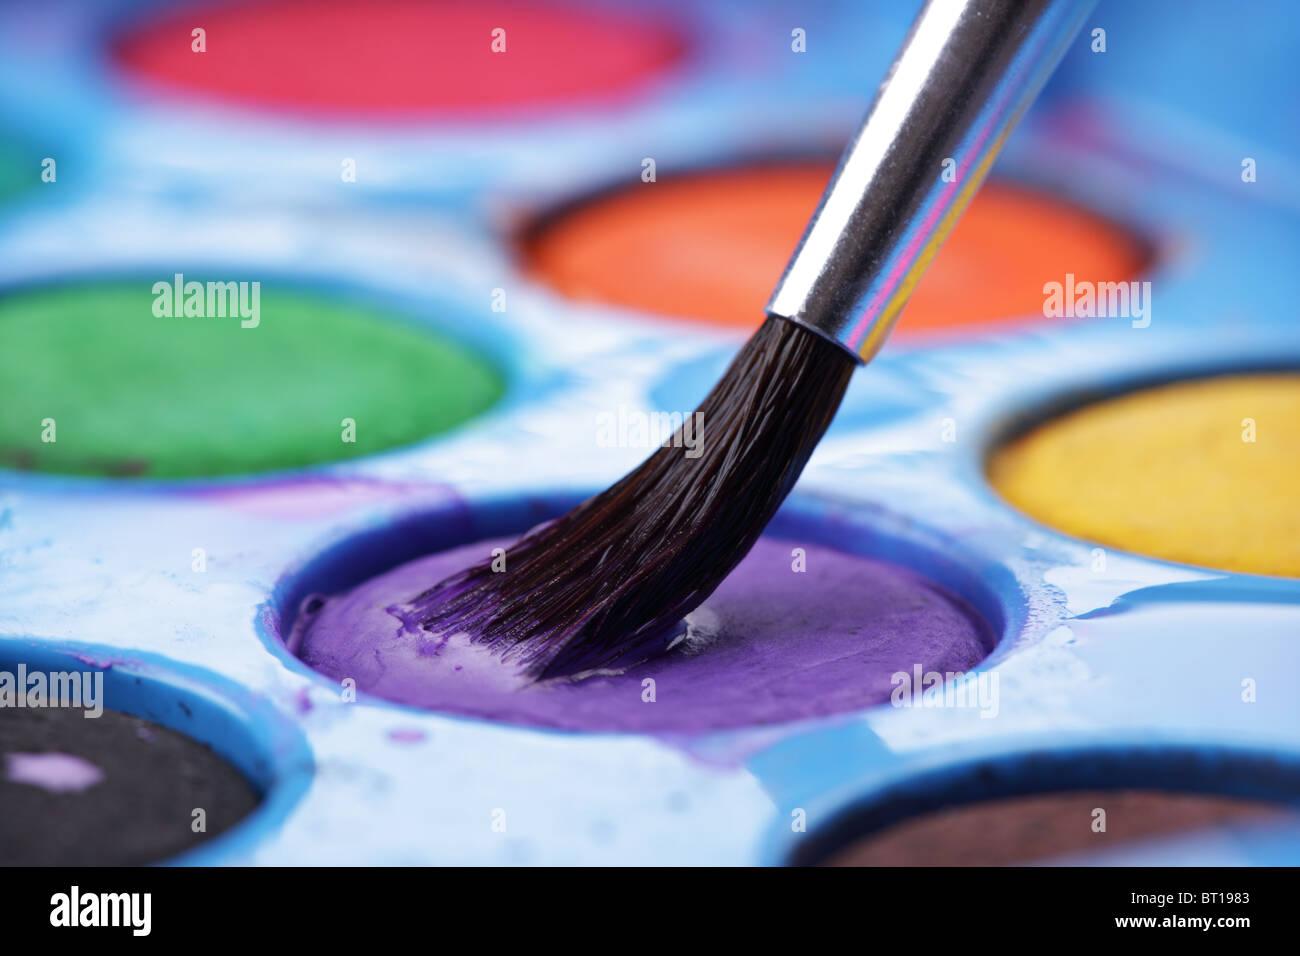 Paleta de acuarela del artista con cepillo Imagen De Stock